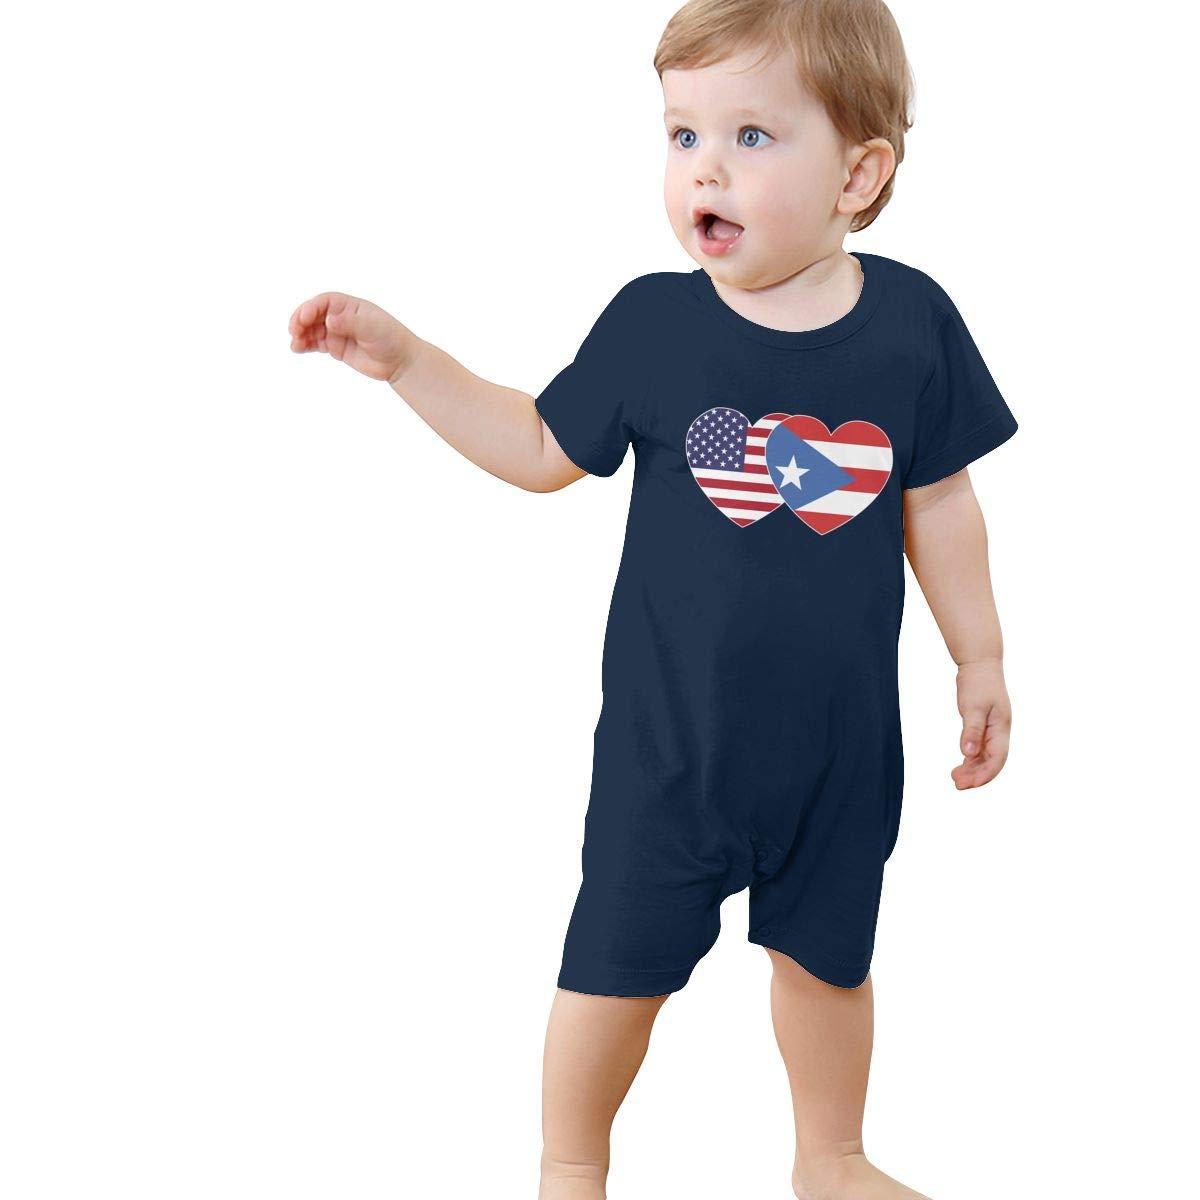 Puerto RICO USA Flag Twin Heart Newborn Baby Short Sleeve Romper Jumpsuit Kid Pajamas 0-24 Months